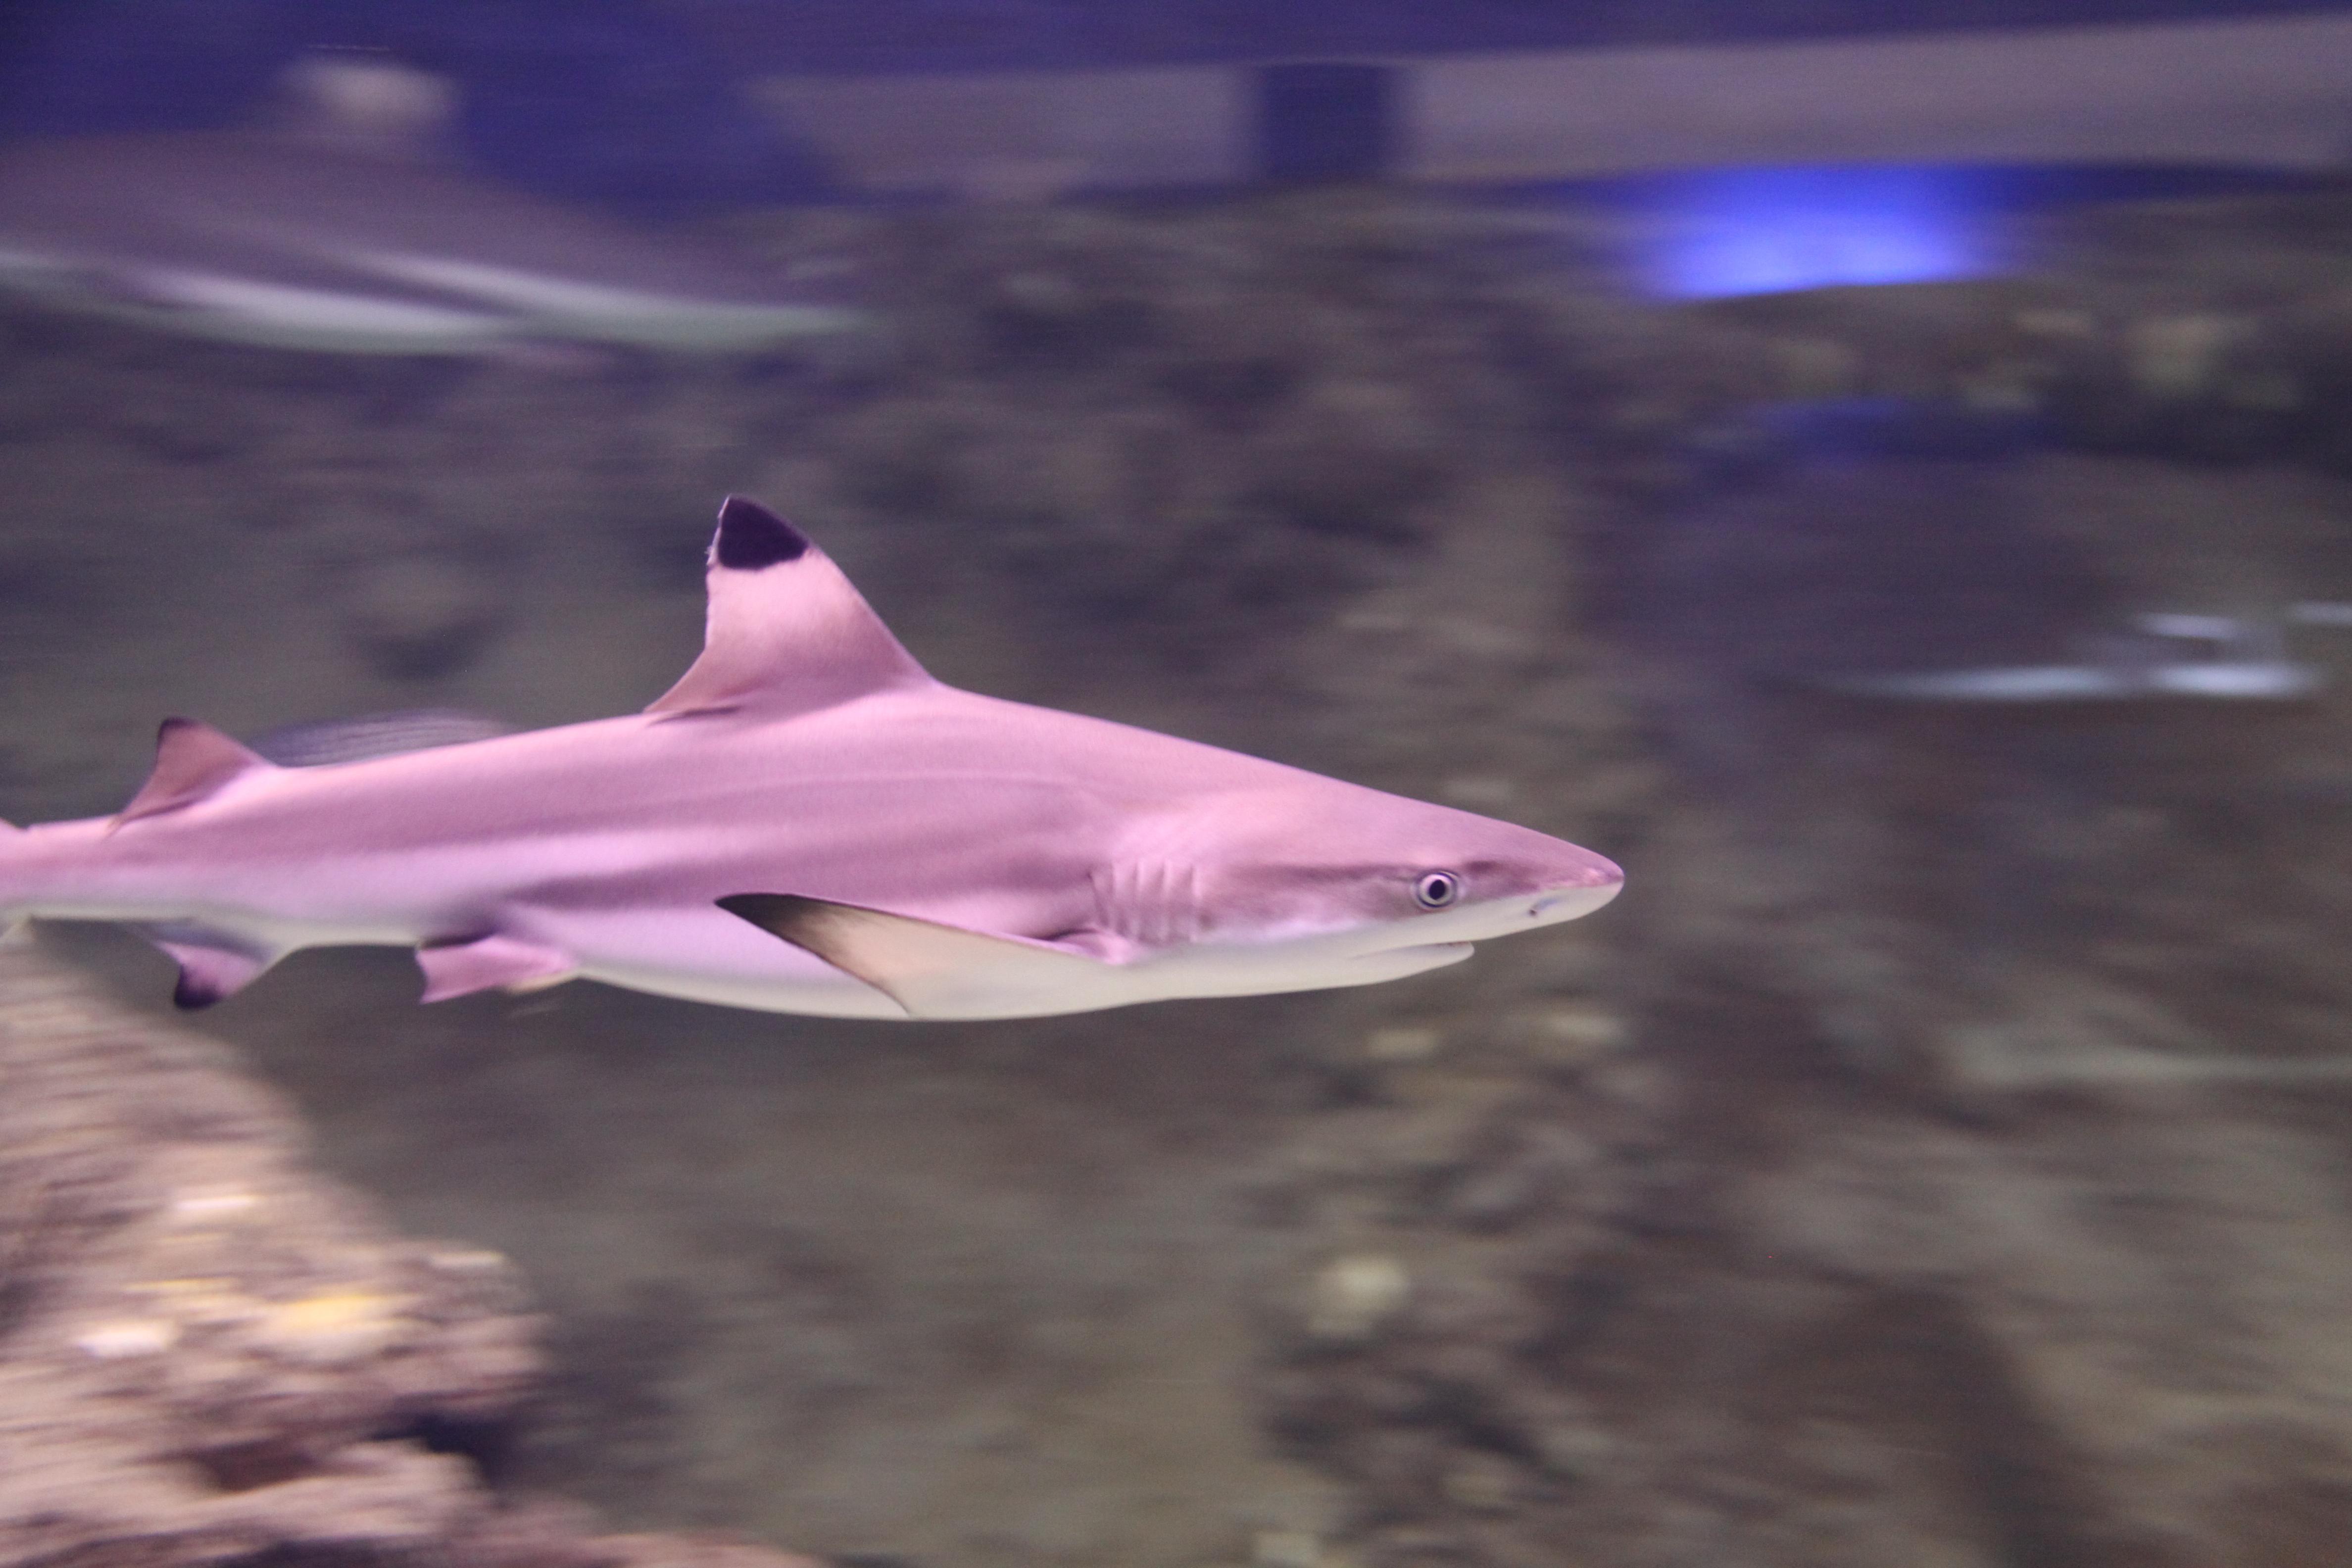 Mondo marino aquarium musei di maremma for Acquario marino